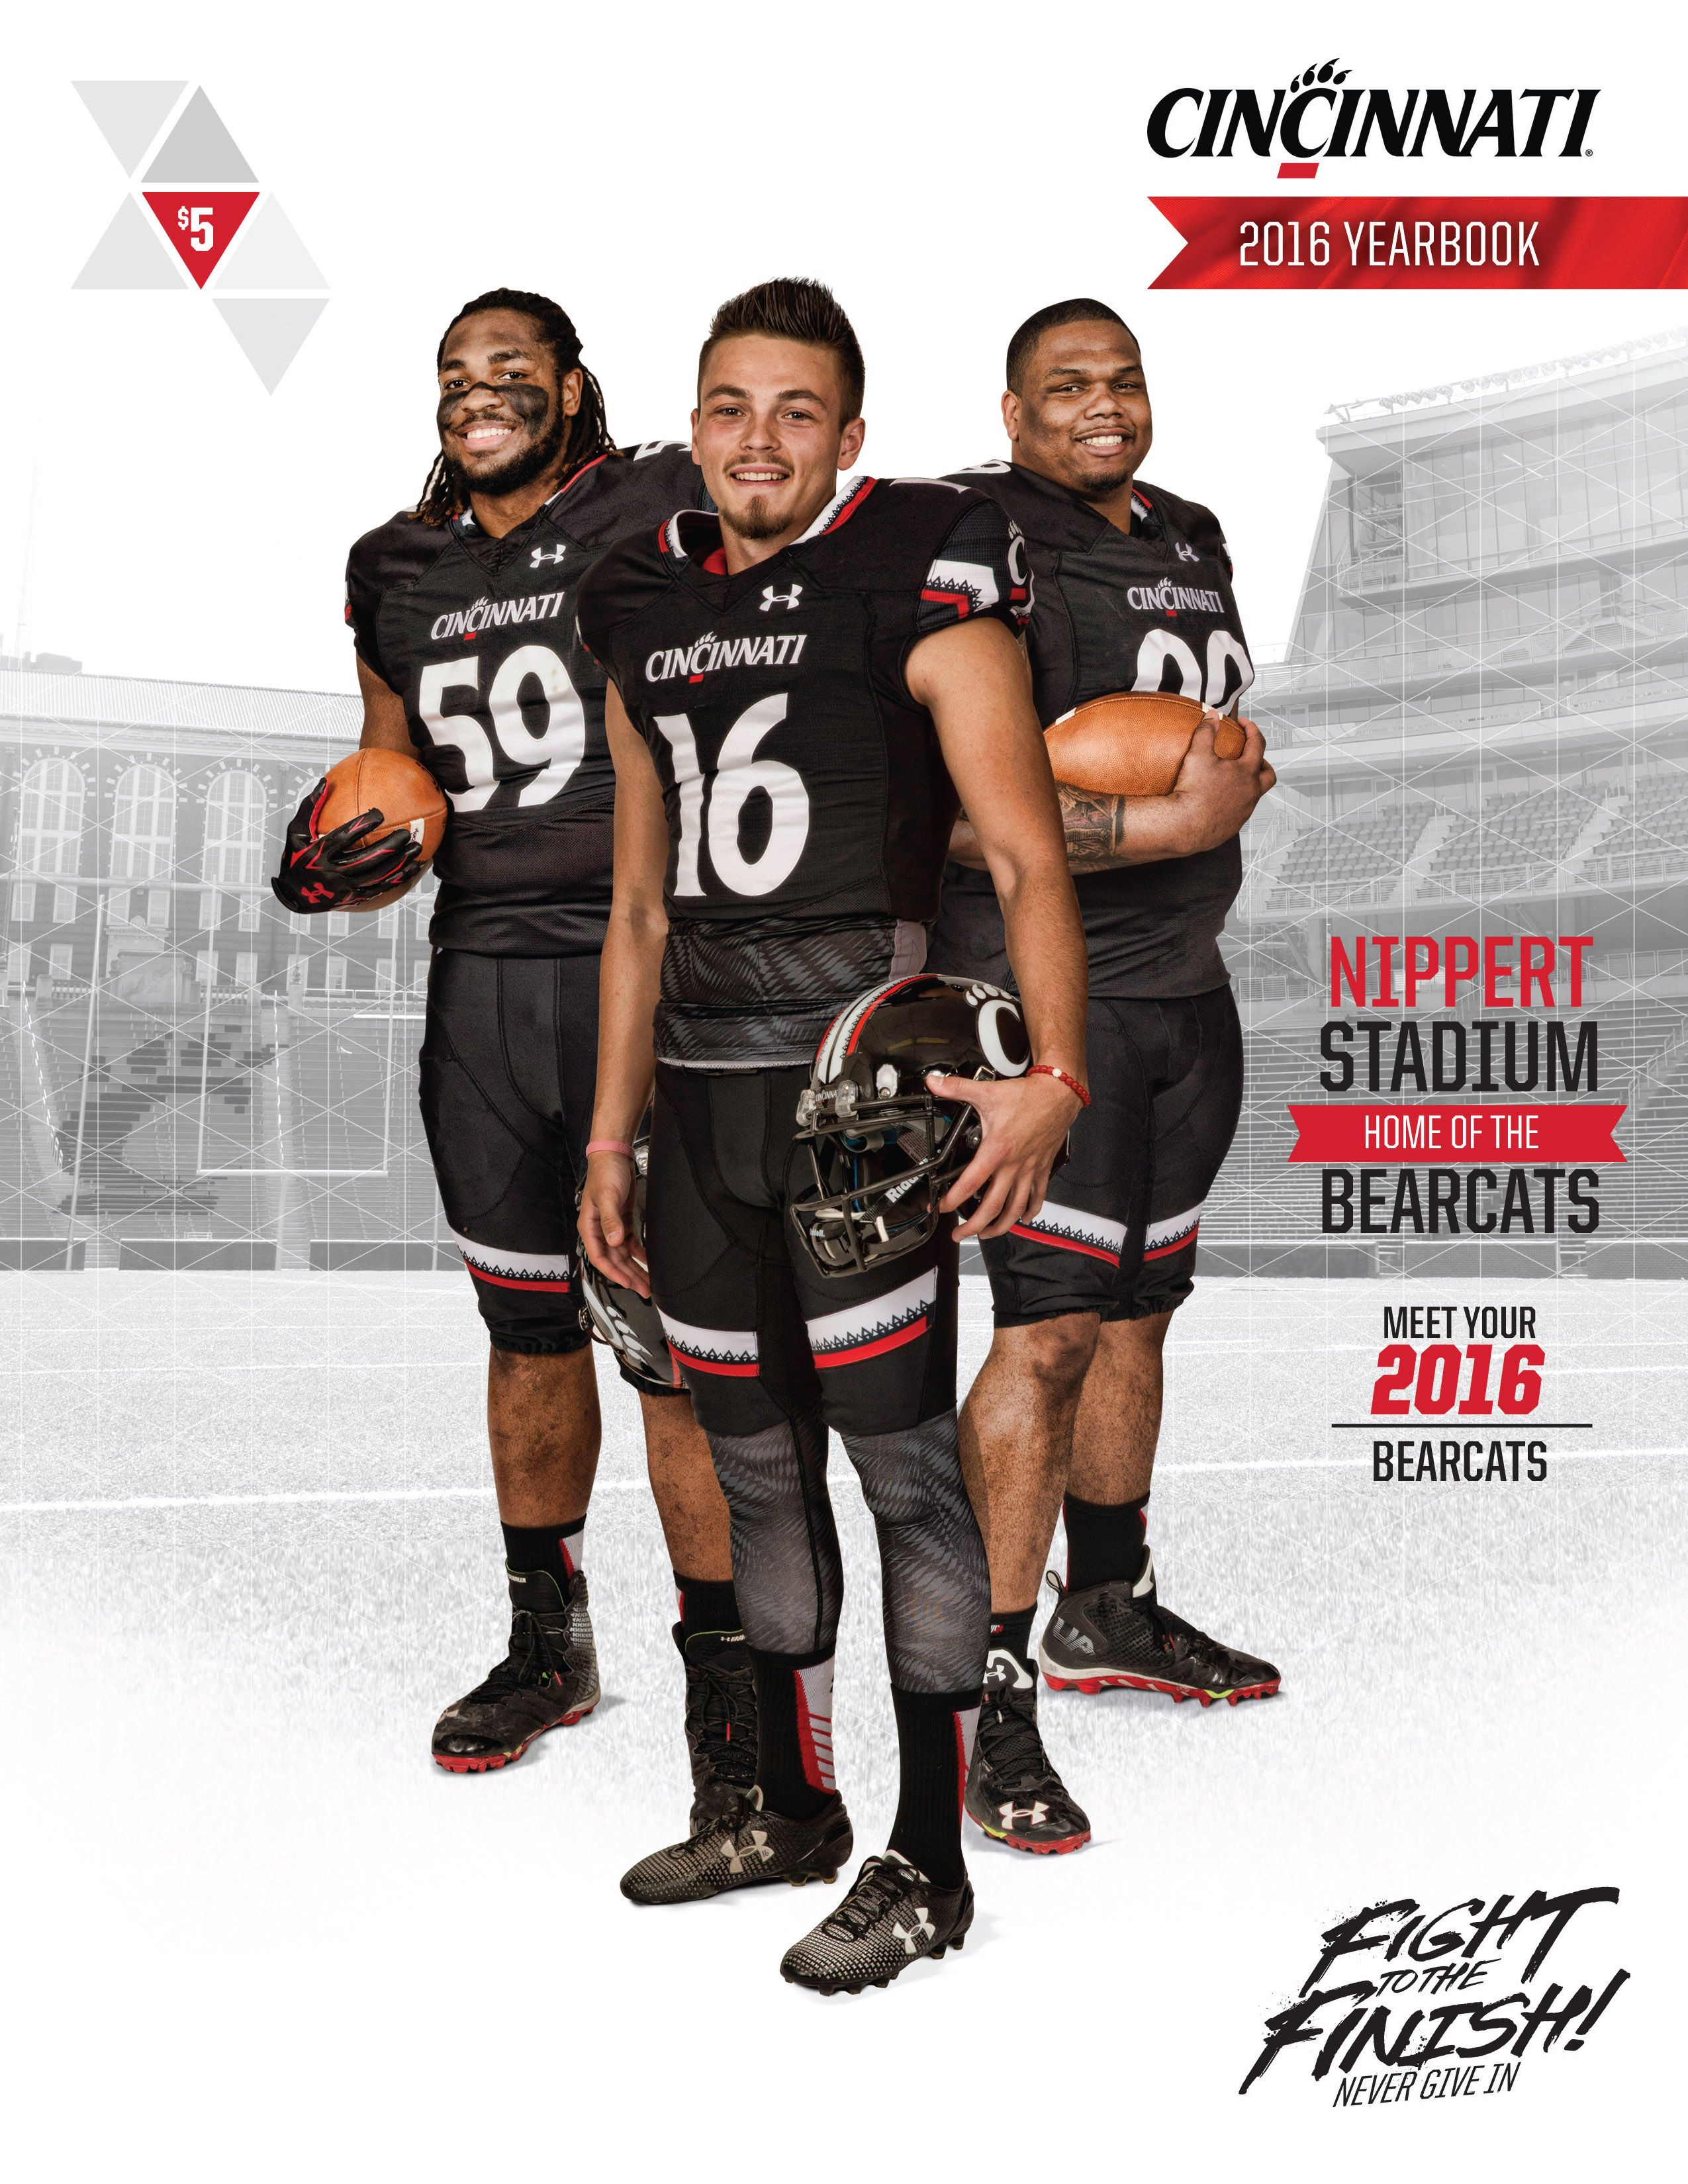 The Official 2016 Gobearcats Cincinnati Football Yearbook Bearcats Cincinnati Football Cincinnati Bearcats Cincinnati